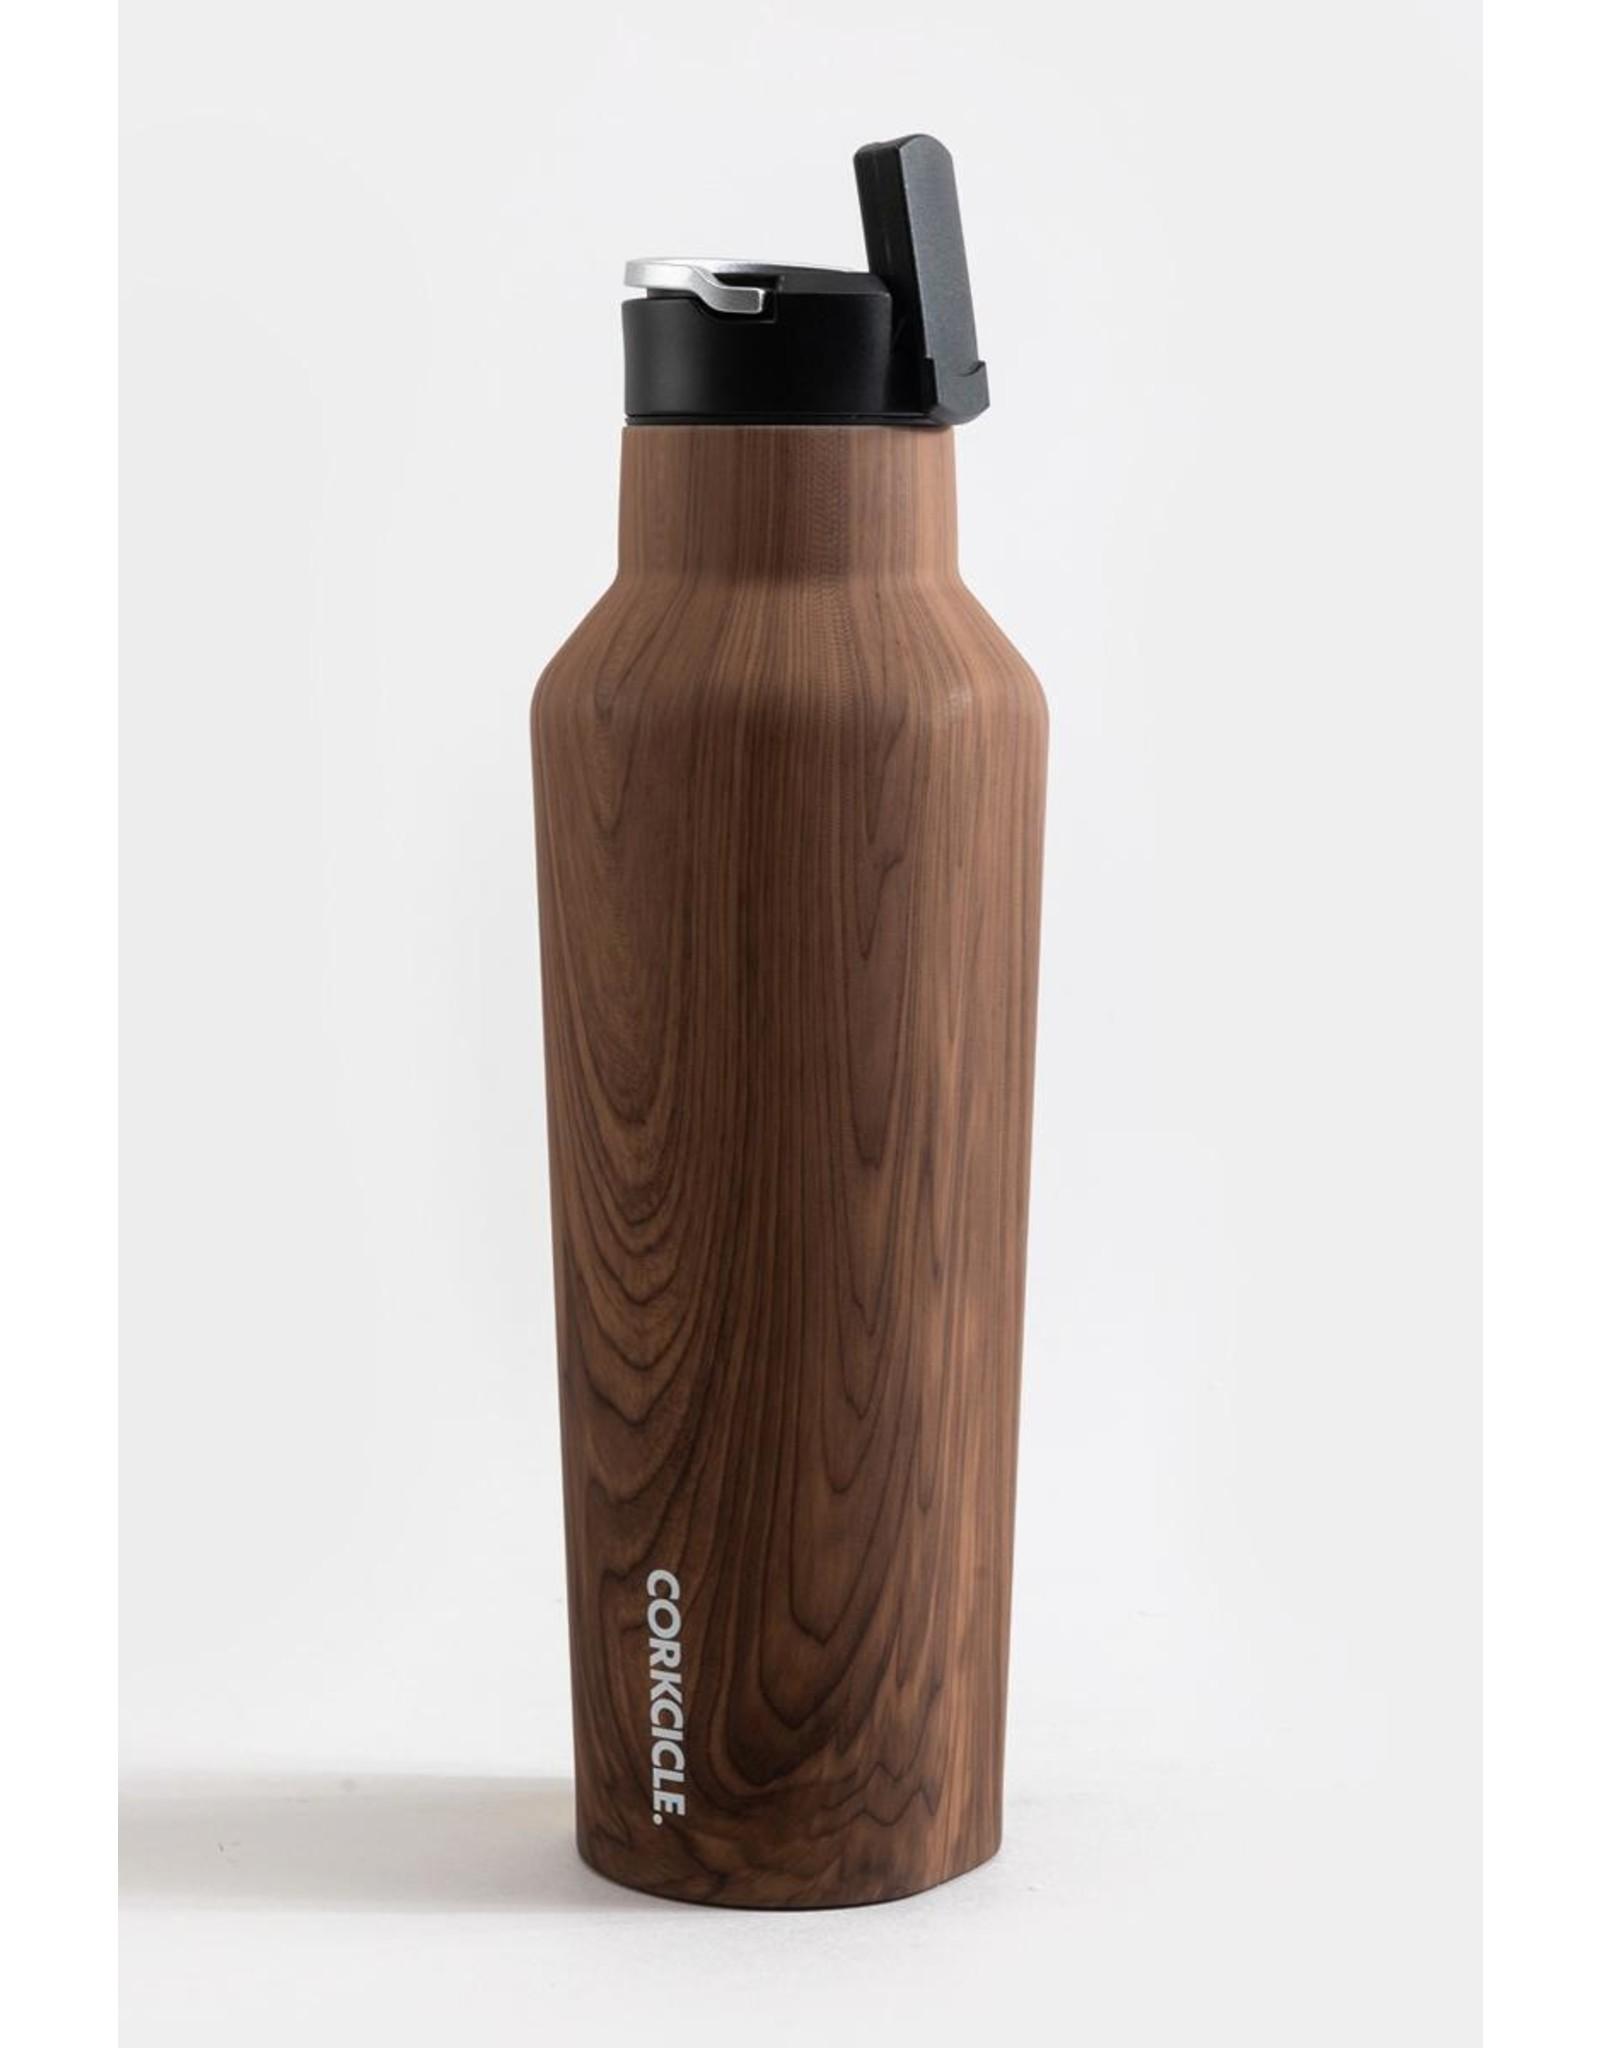 Corkcicle Sport Canteen Bottle - 20oz Walnut Wood